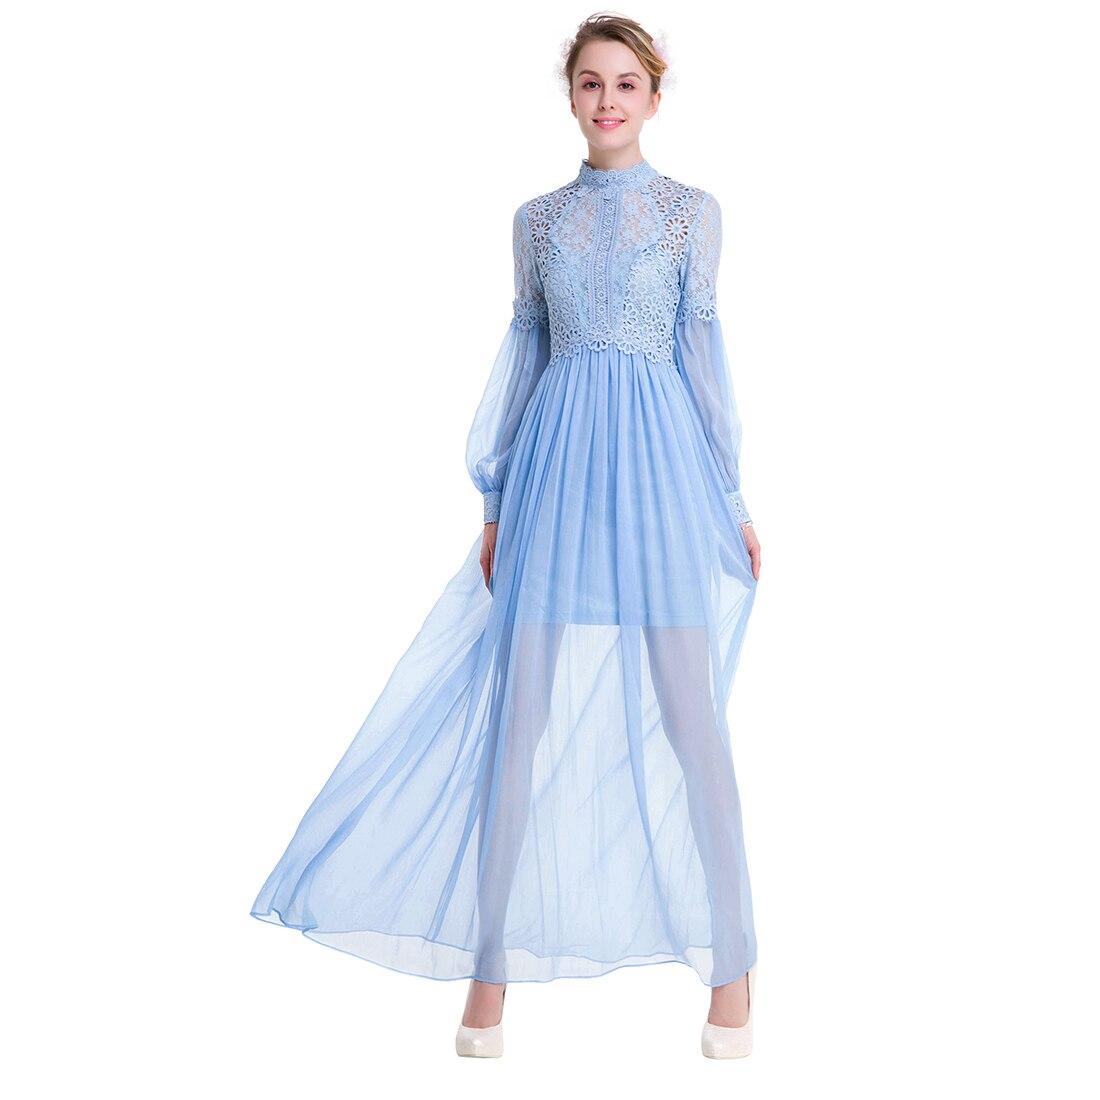 TFGS Original Design Women Original Design Spring Lace Chiffon Two Piece Dress For Women Vintage Hollow